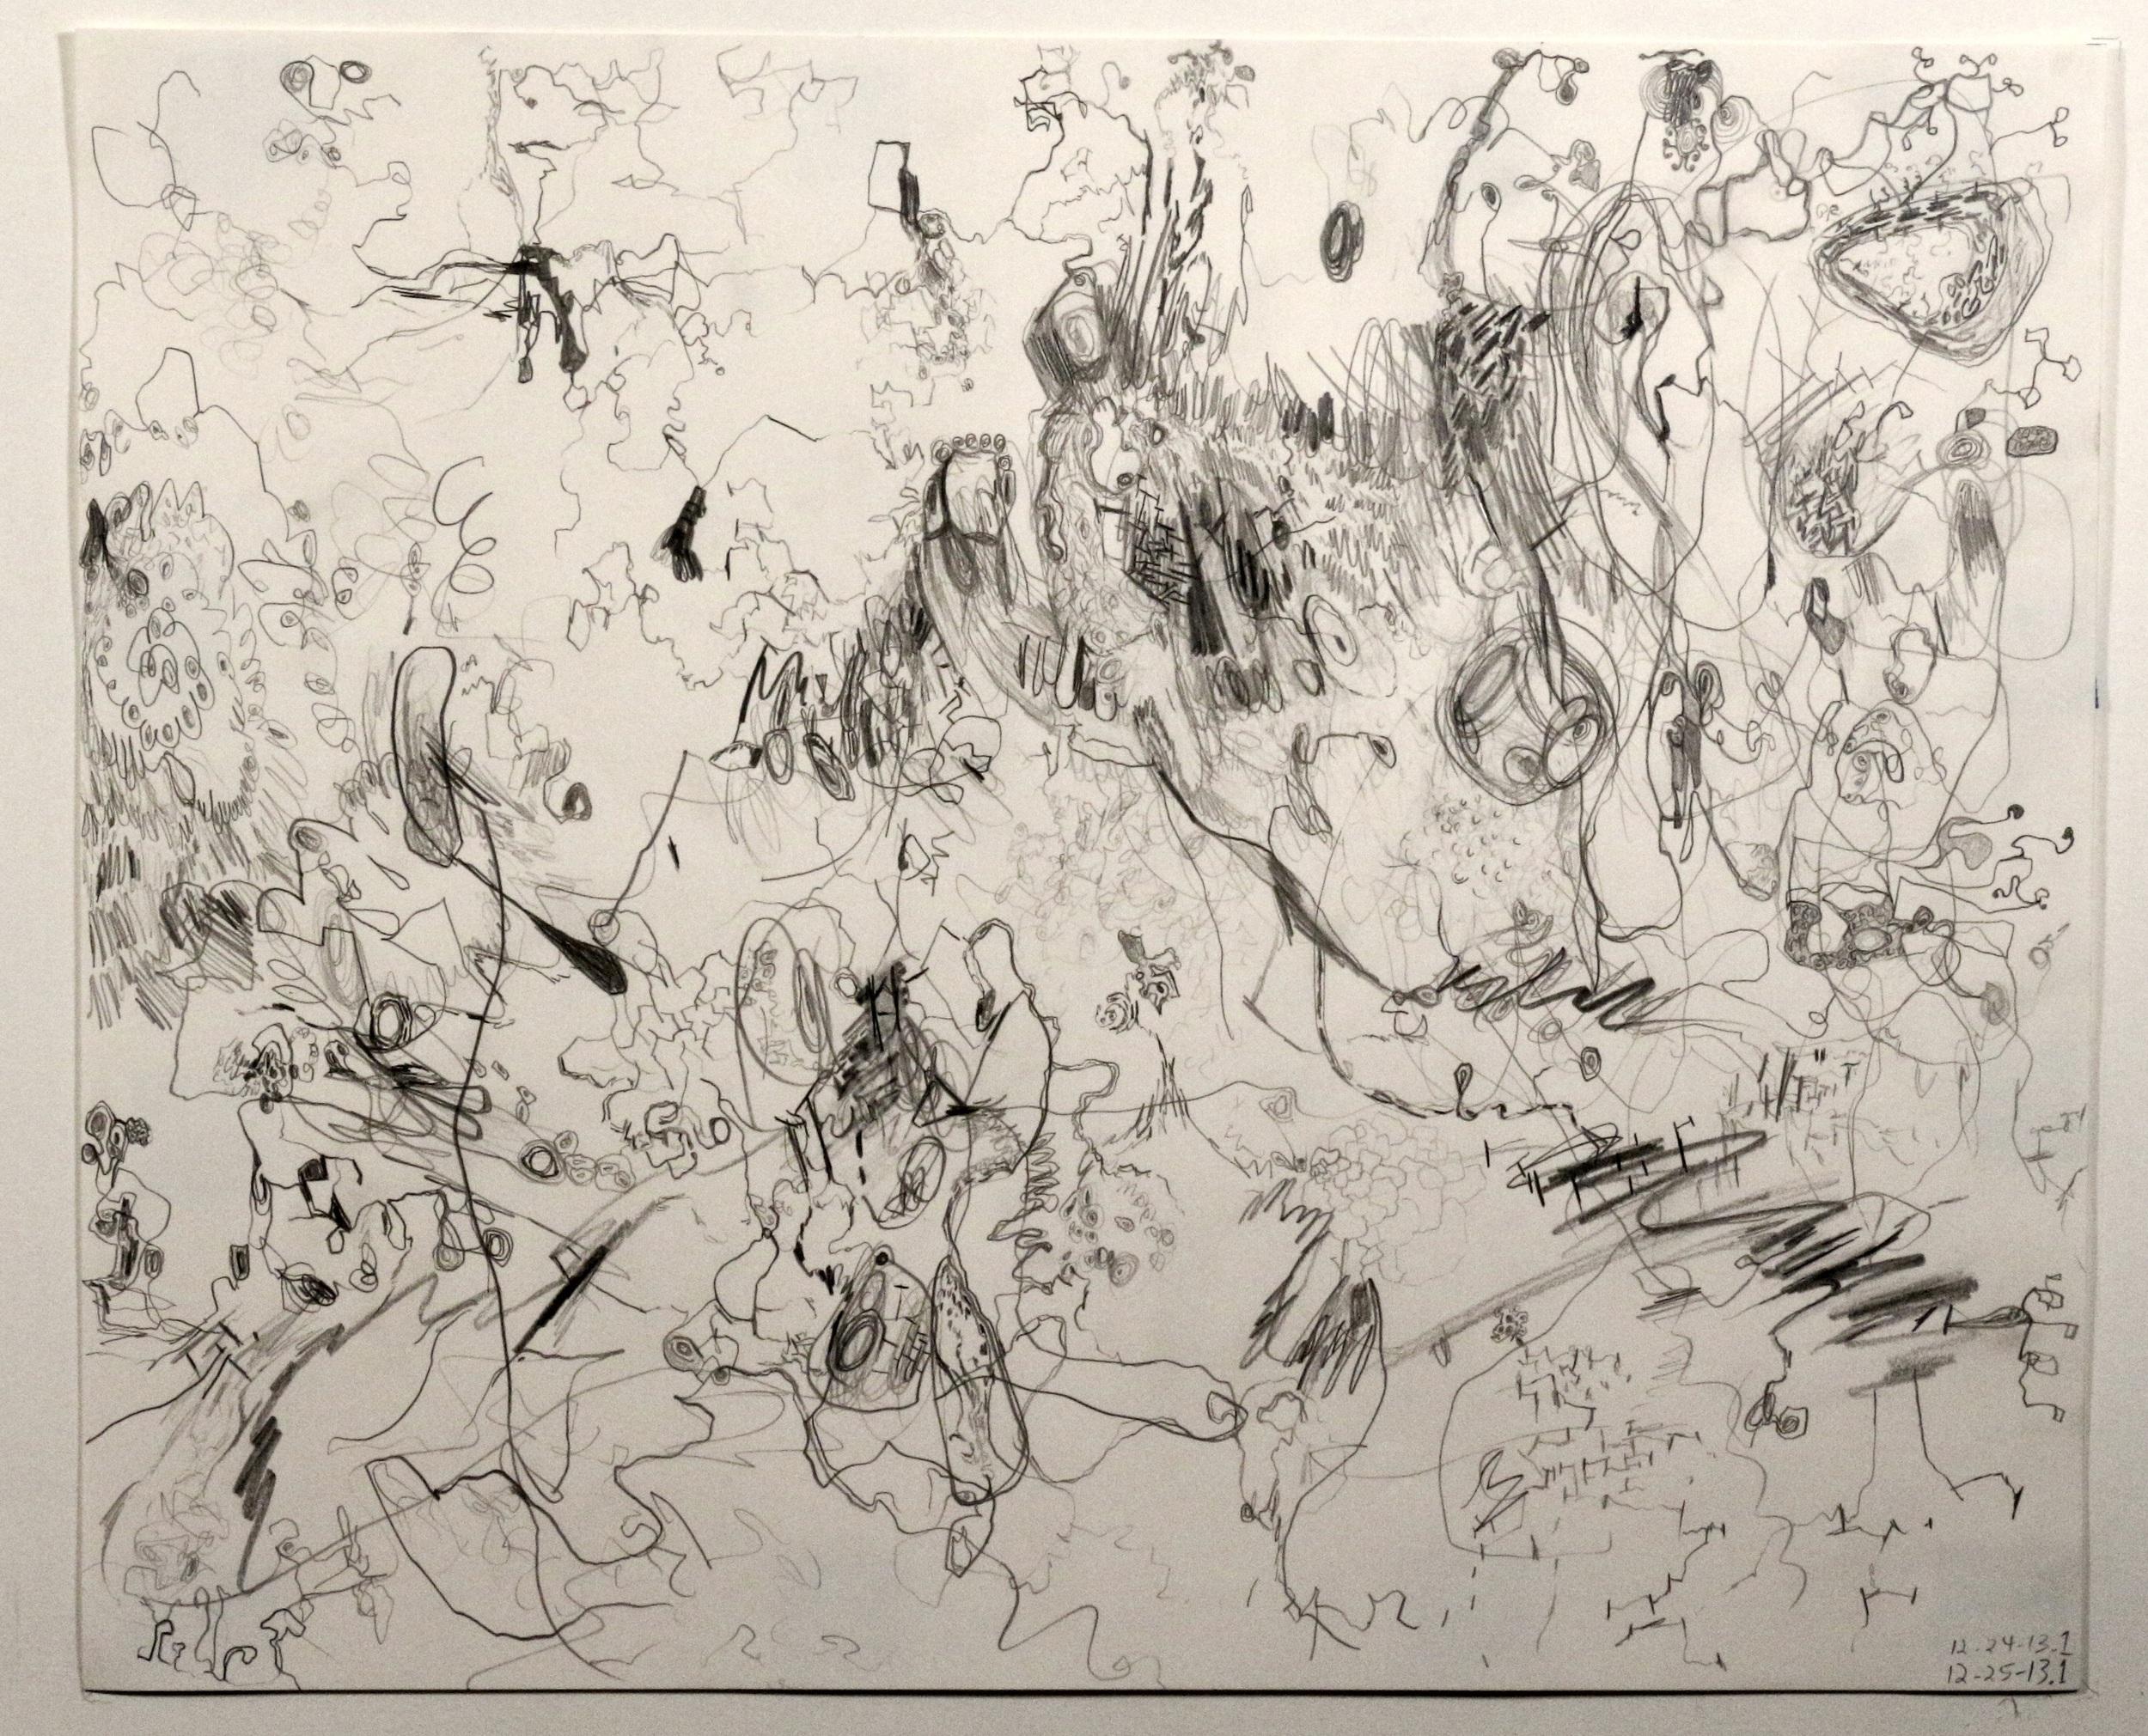 Untitled (12-24-13.1)